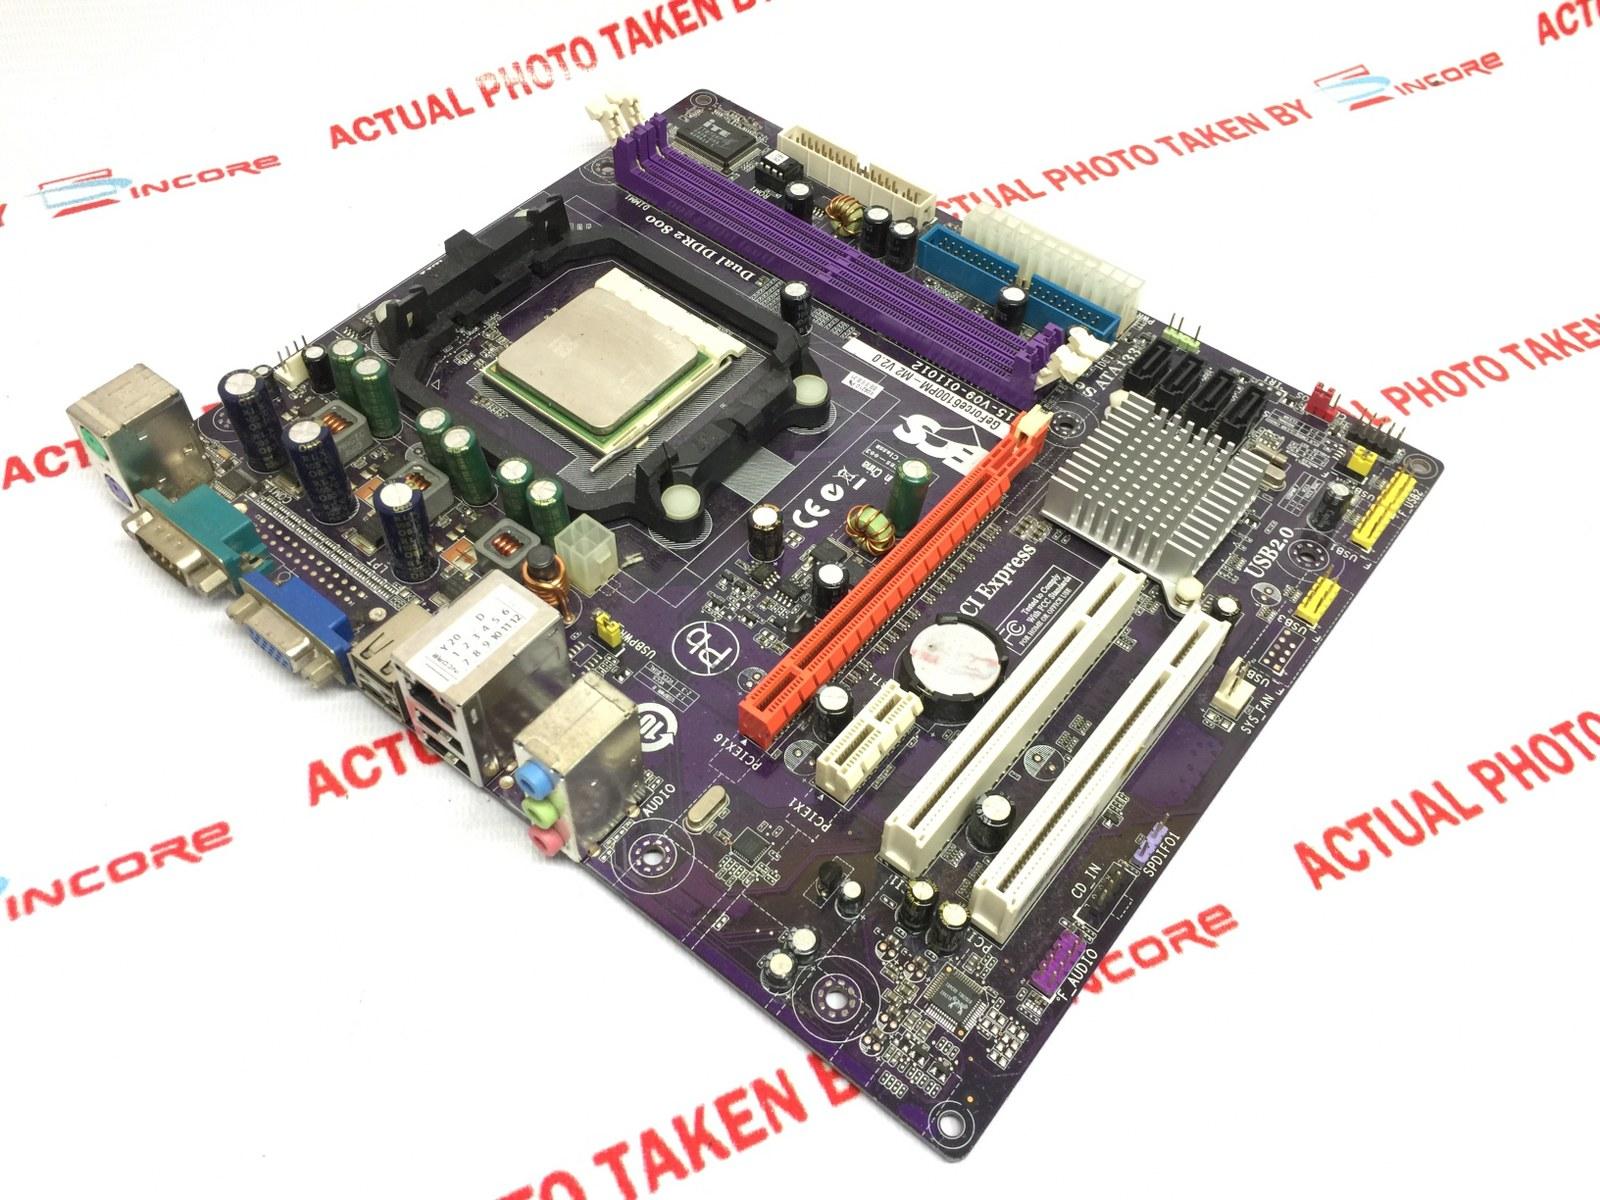 ECS GeForcePM-M2 - - motherboard - micro ATX - Socket AM2 - GeForce Specs